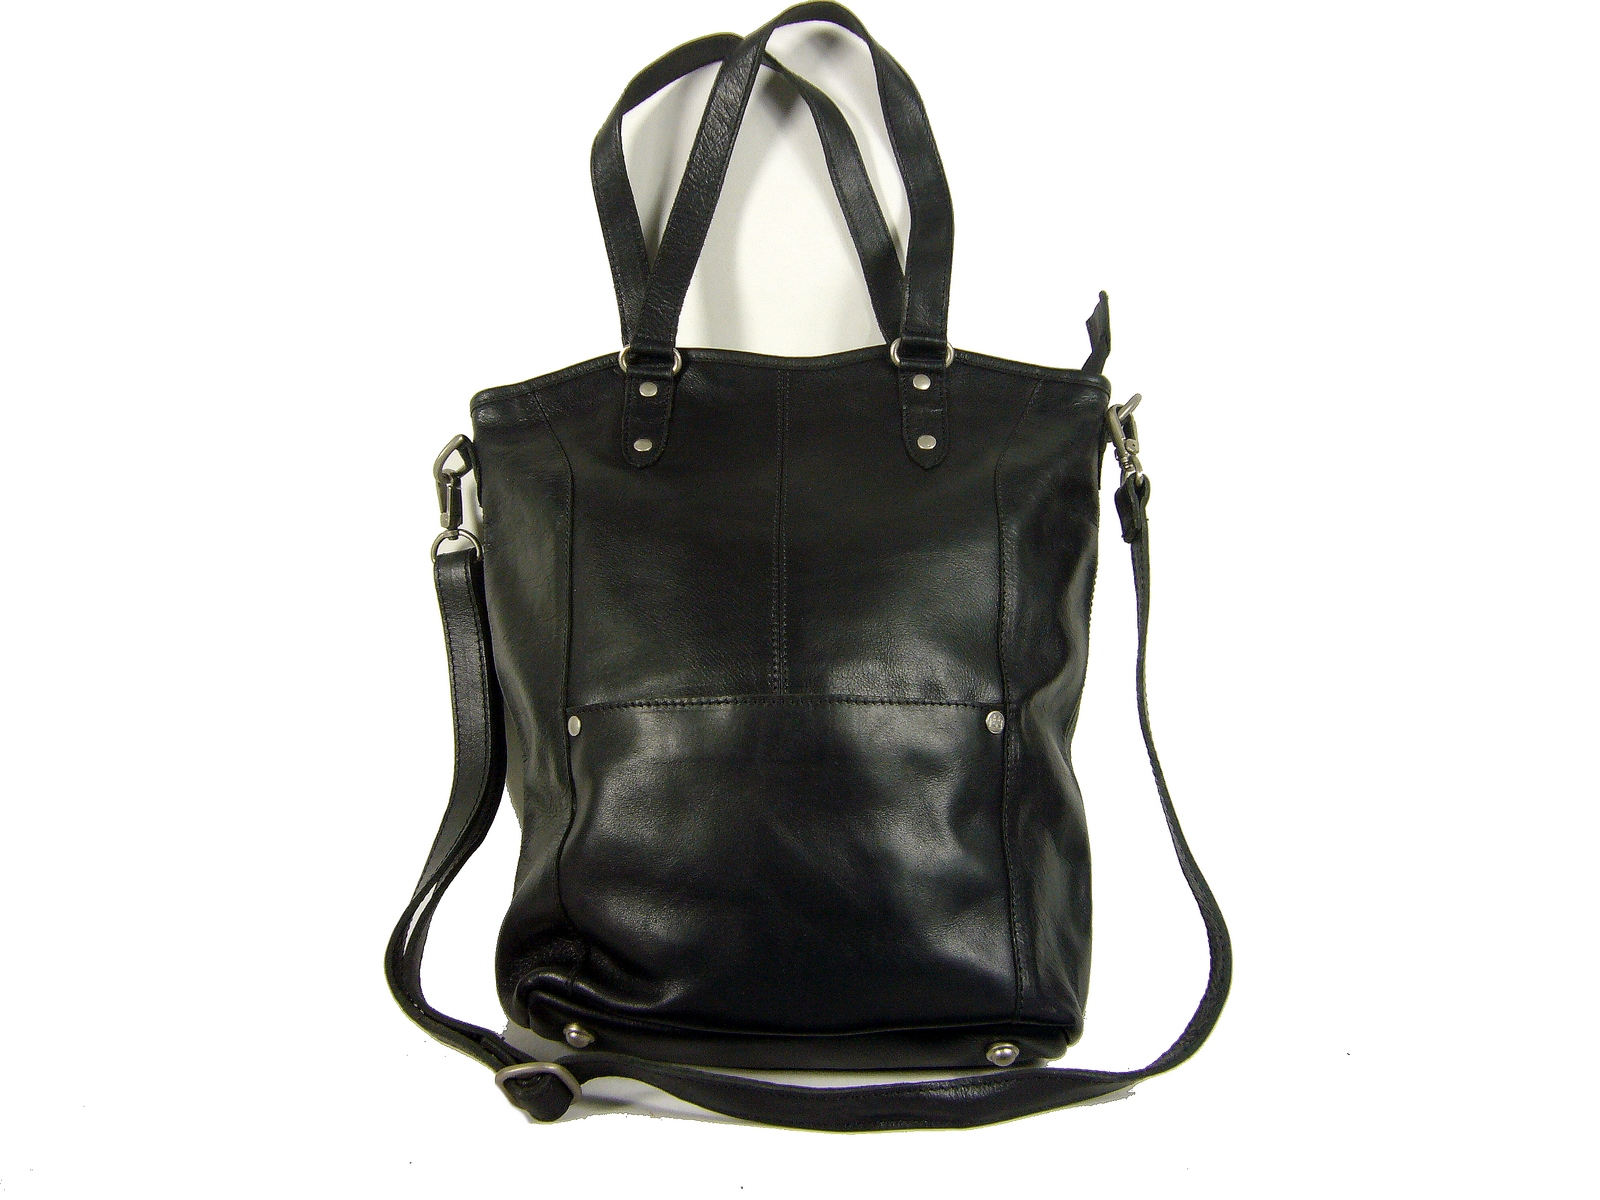 65d387f587 Sac shopping femme cuir noir Paros / Cowboysbag - Espritcuir